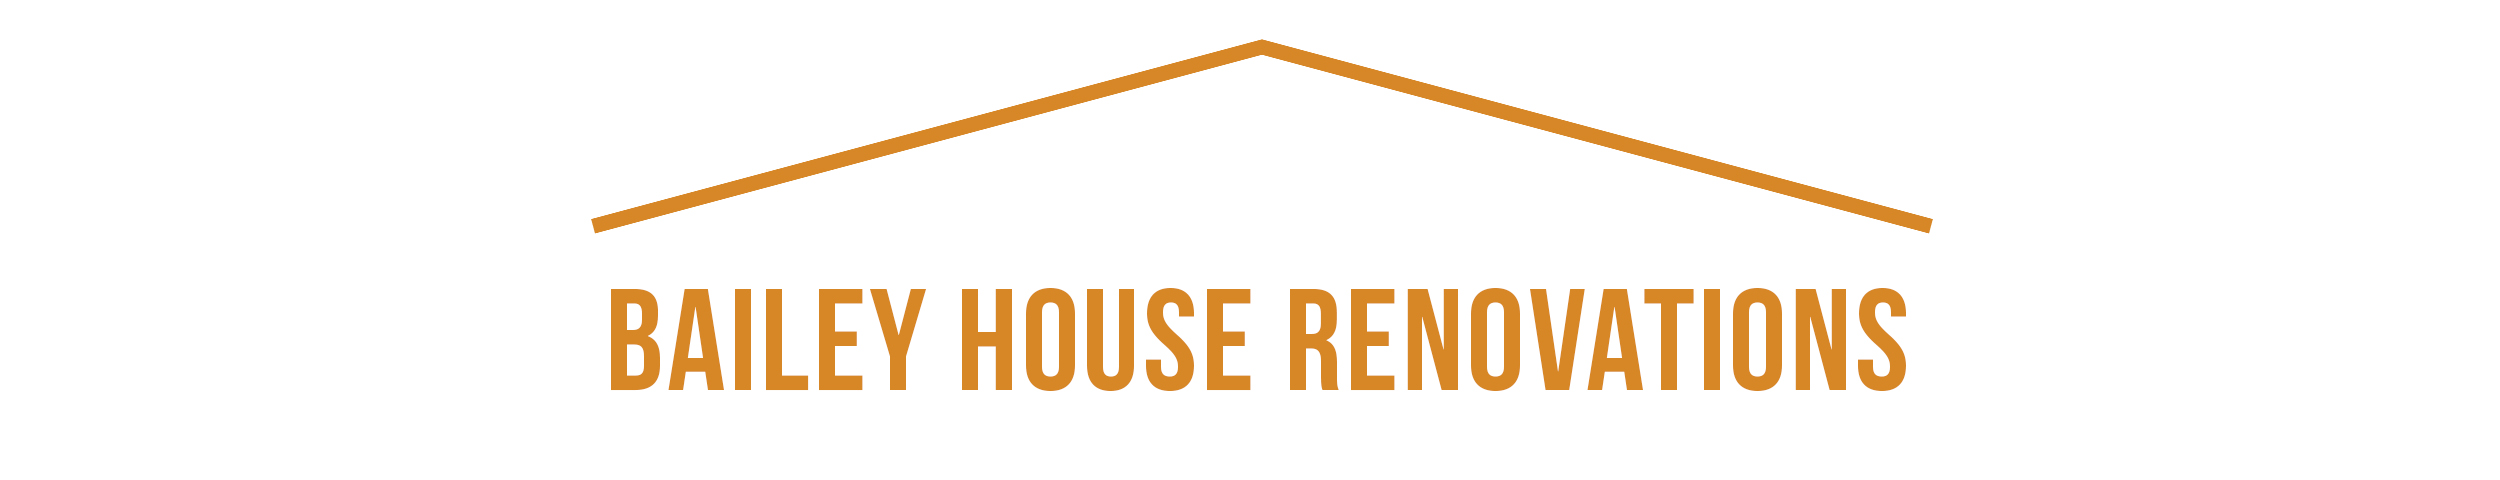 BAILEY HOUSE RENOVATIONS.jpg